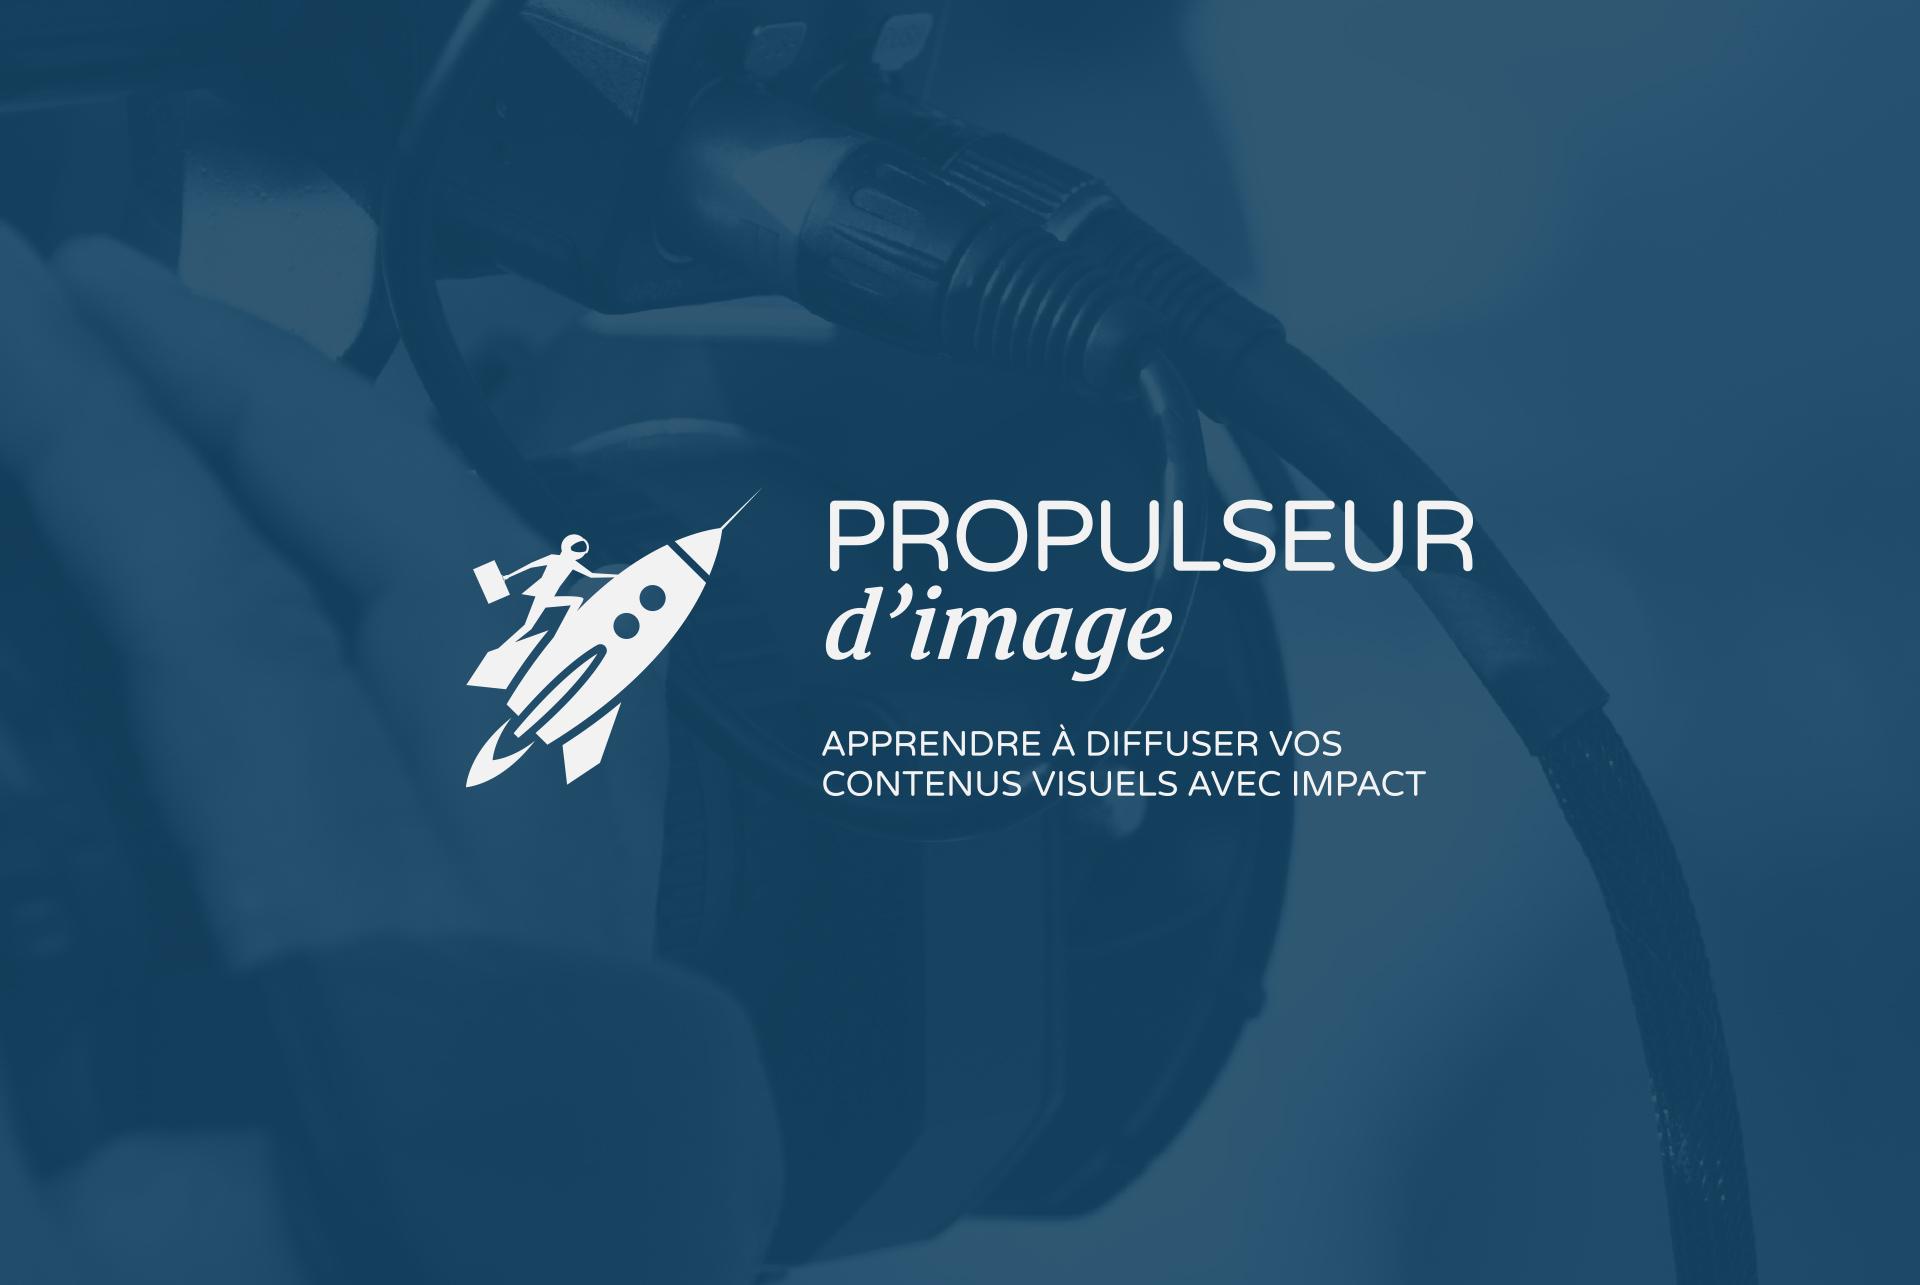 Logo / Propulseur d'image